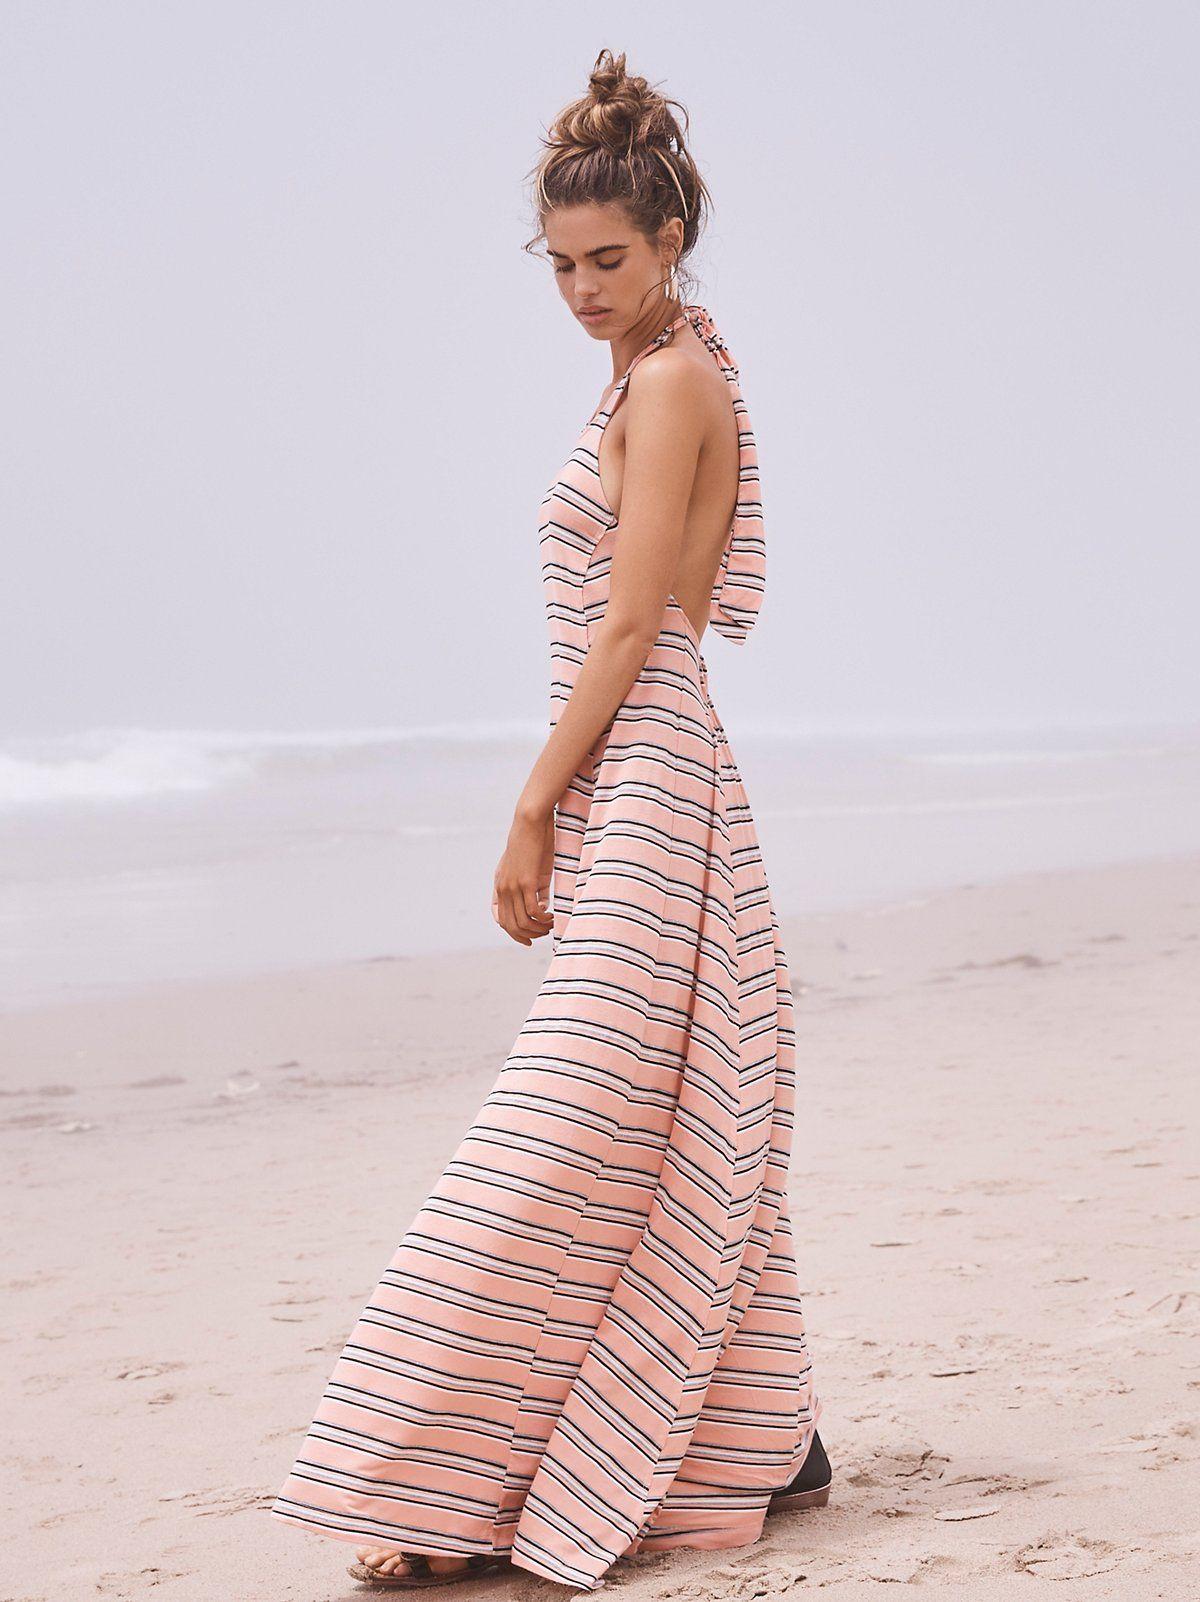 Waikiki Maxi Dress Maxi Dress Maxi Outfits Long Sleeve Embroidered Dress [ 1602 x 1200 Pixel ]